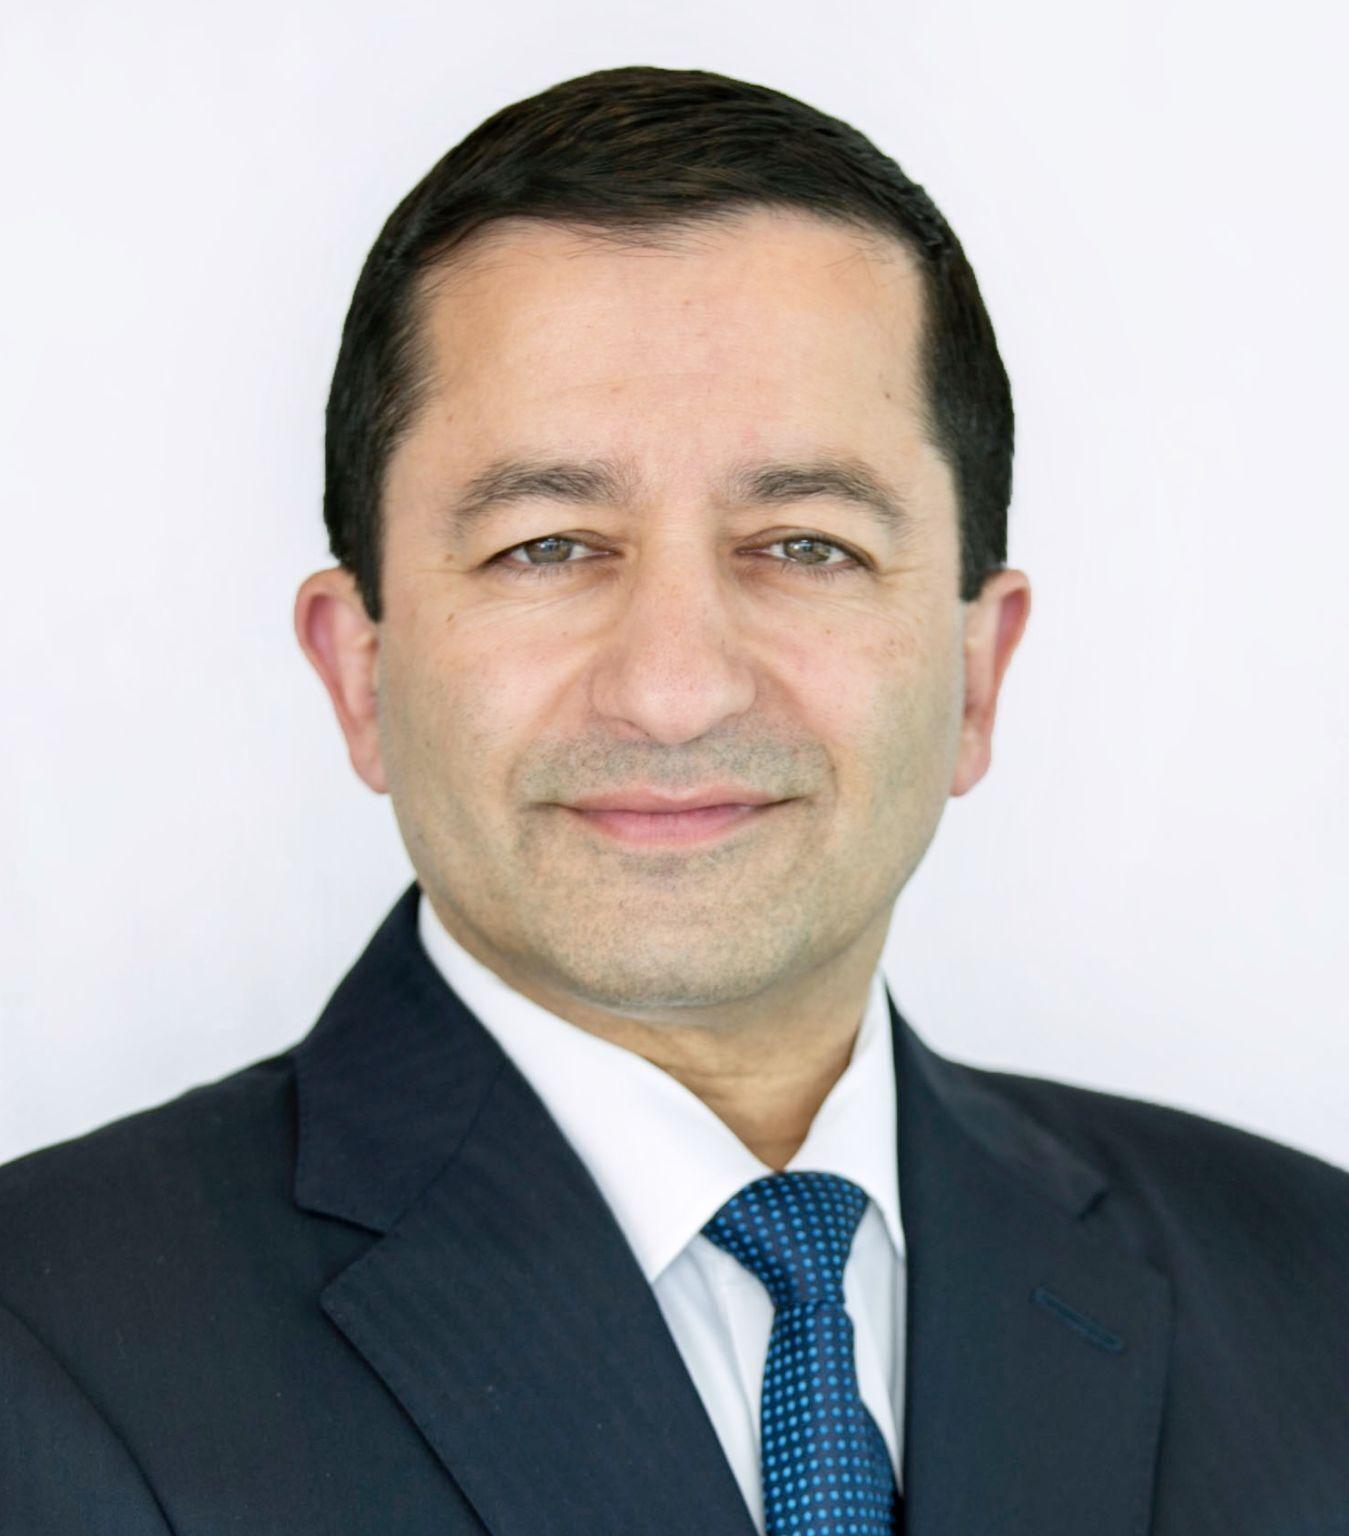 Dr. Vinay Badhwar